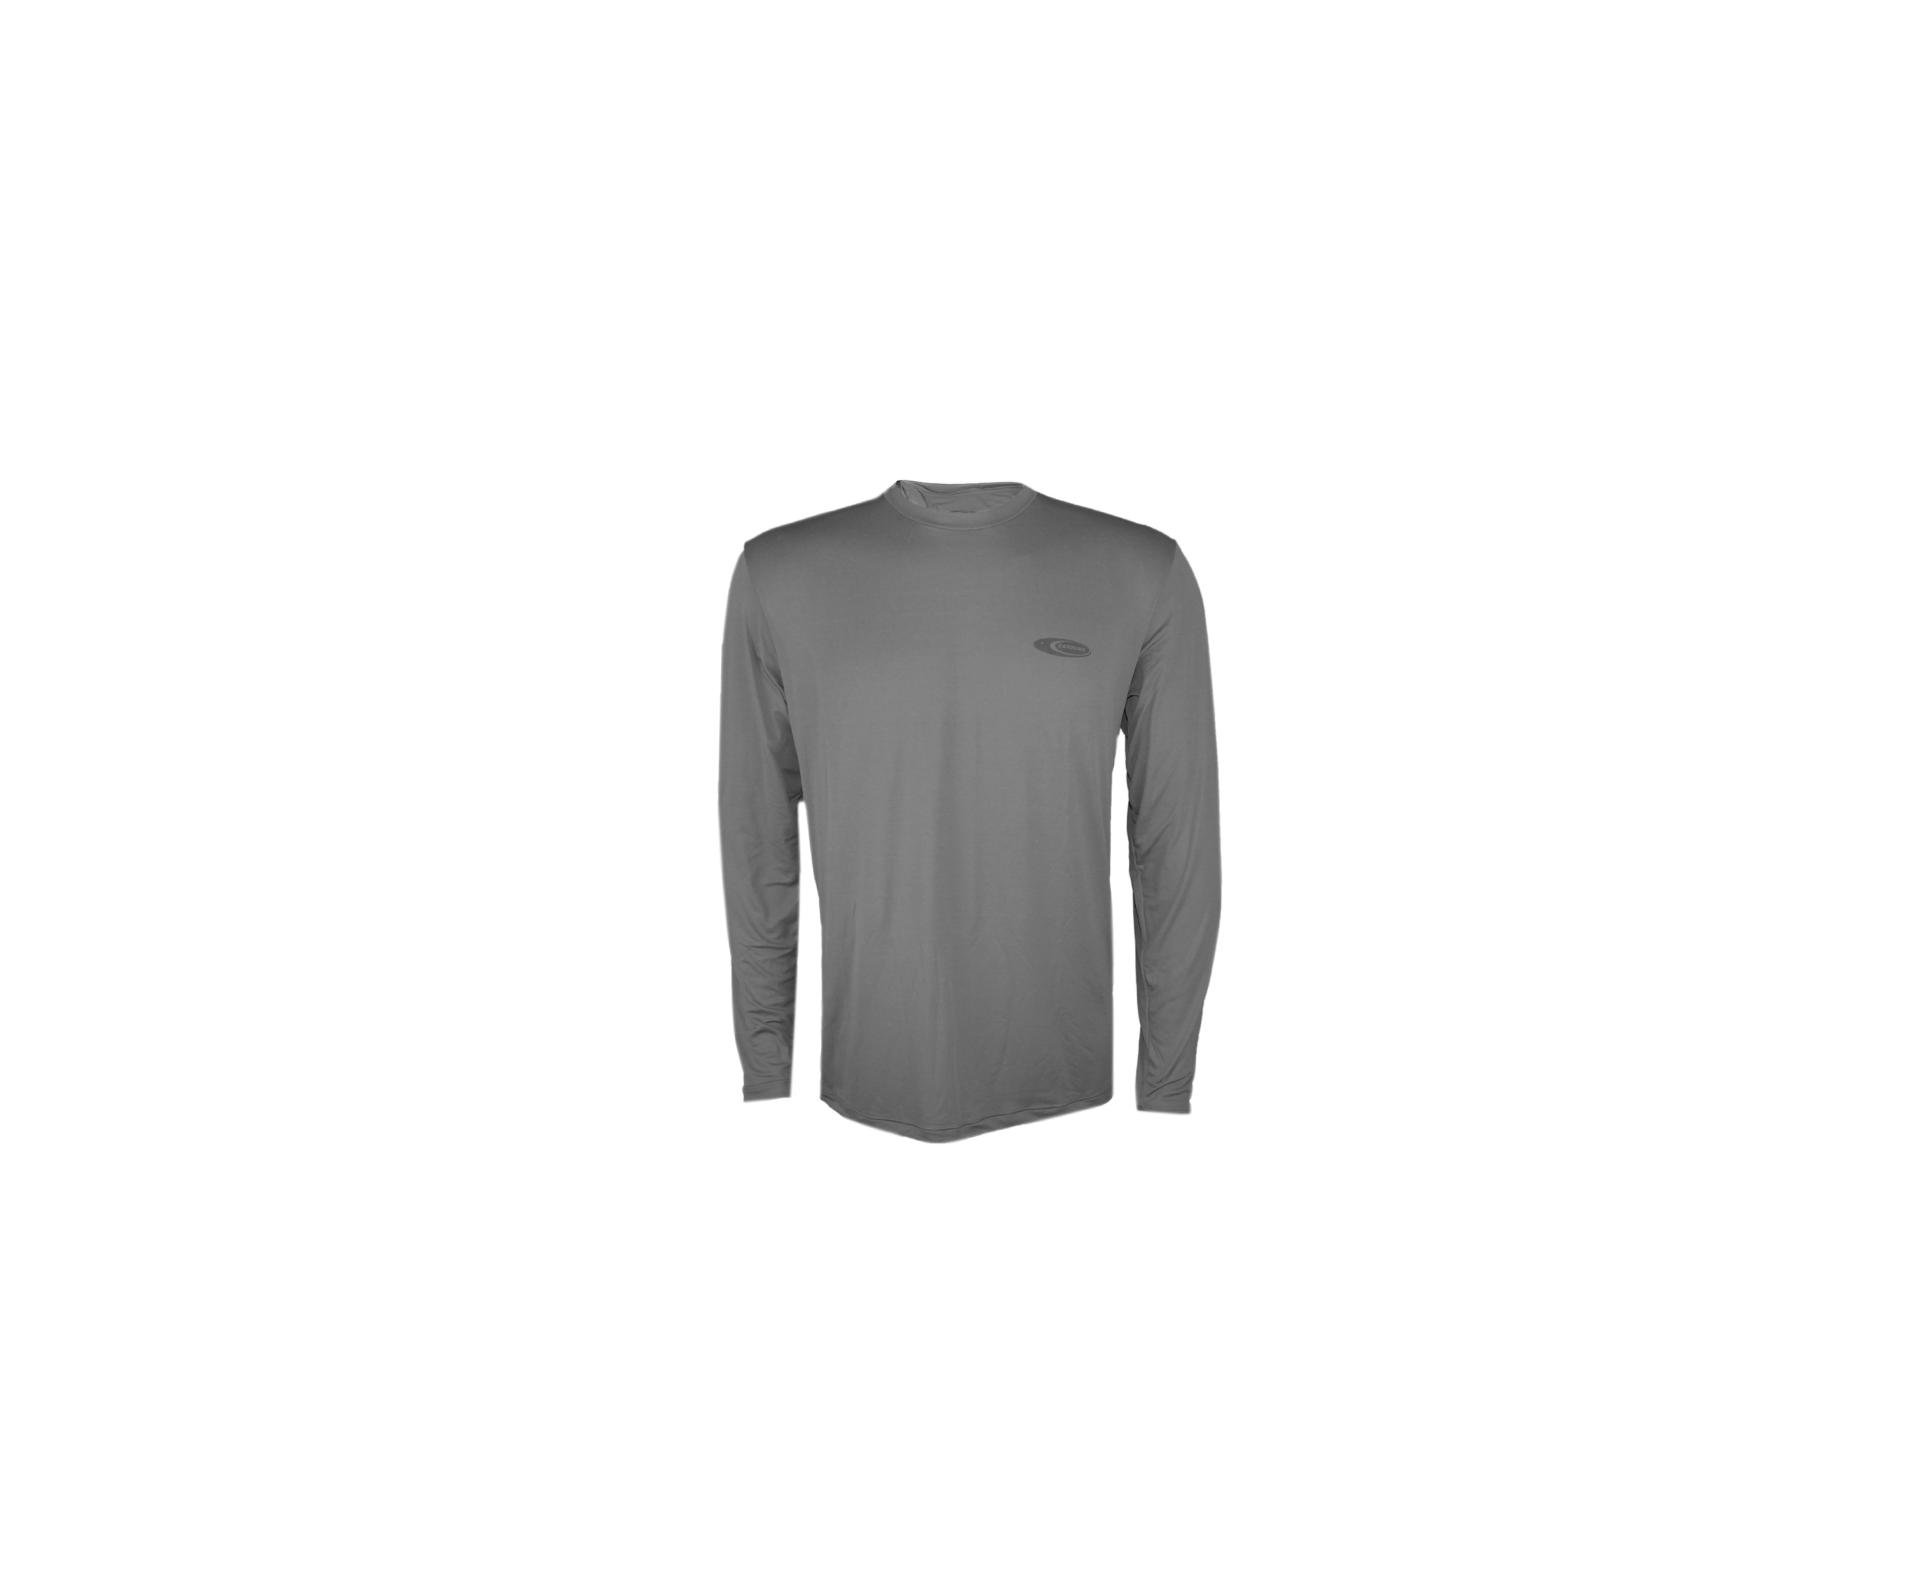 Camiseta Softline Chumbo - Proteção Uva/uvb 50+ Fps - Cardume